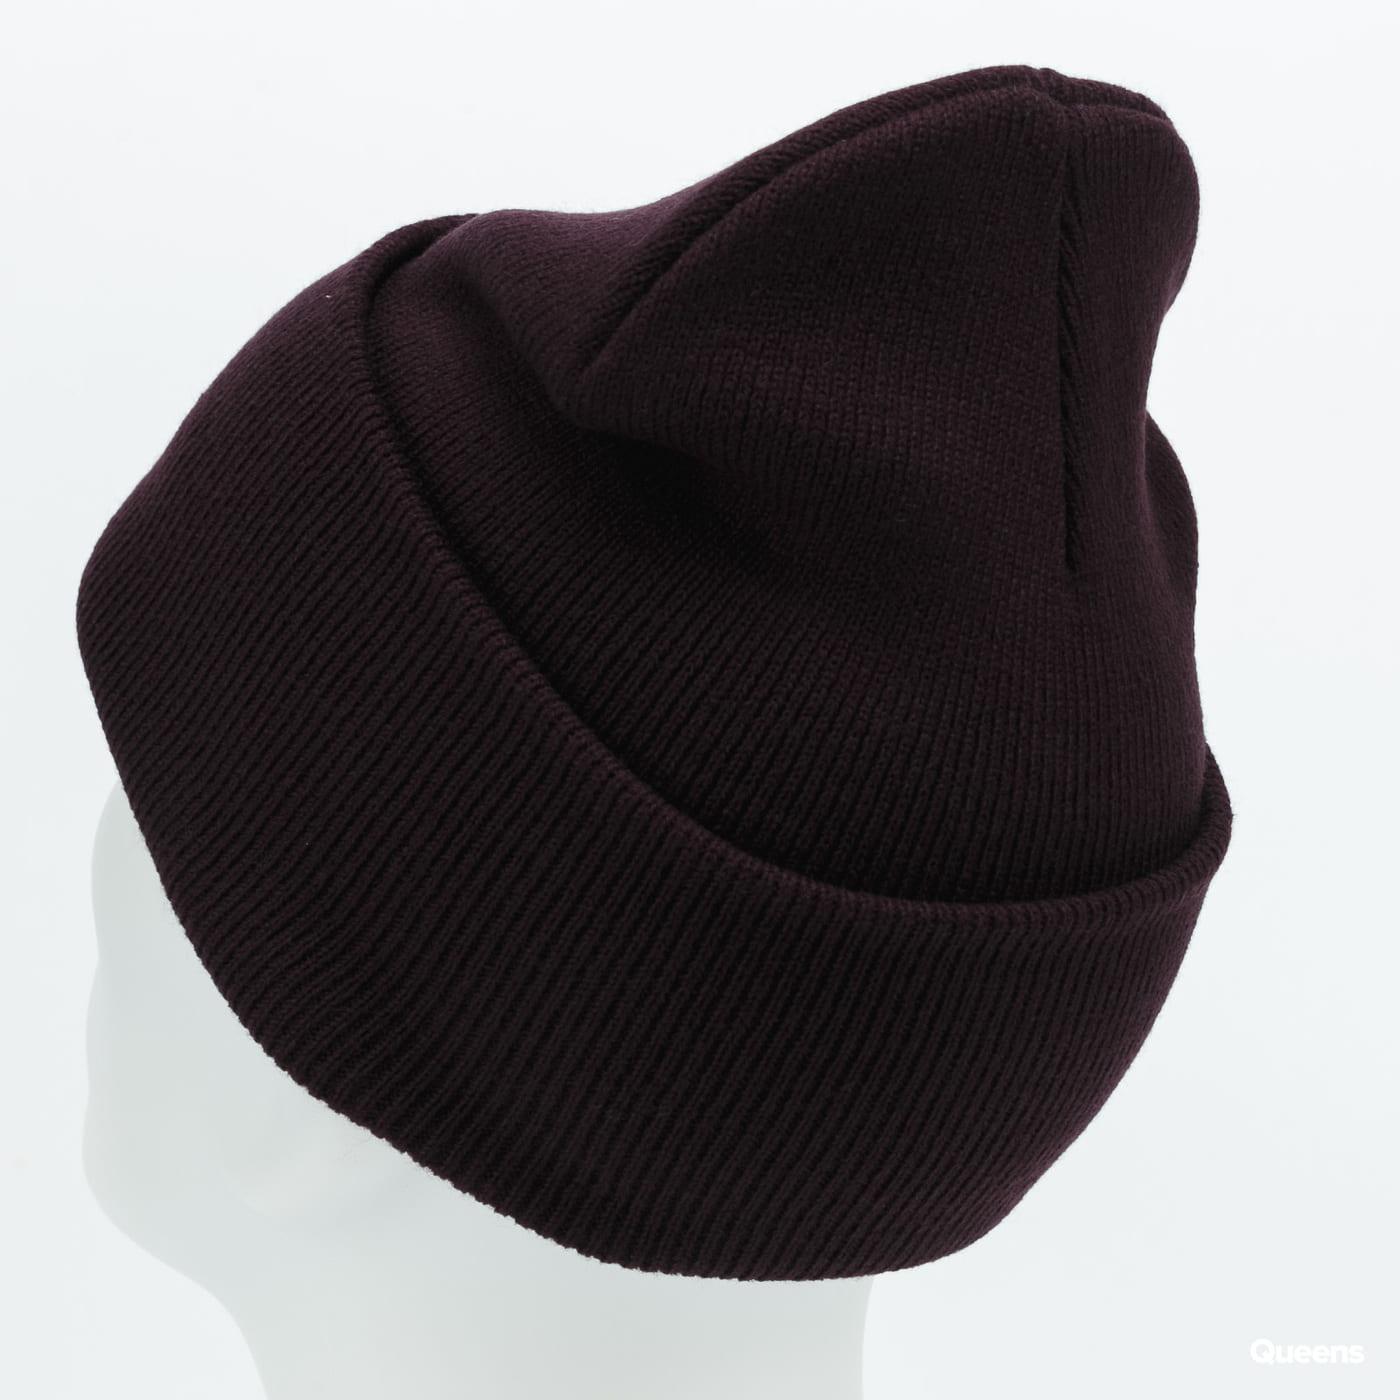 Carhartt WIP Acrylic Watch Hat dark purple